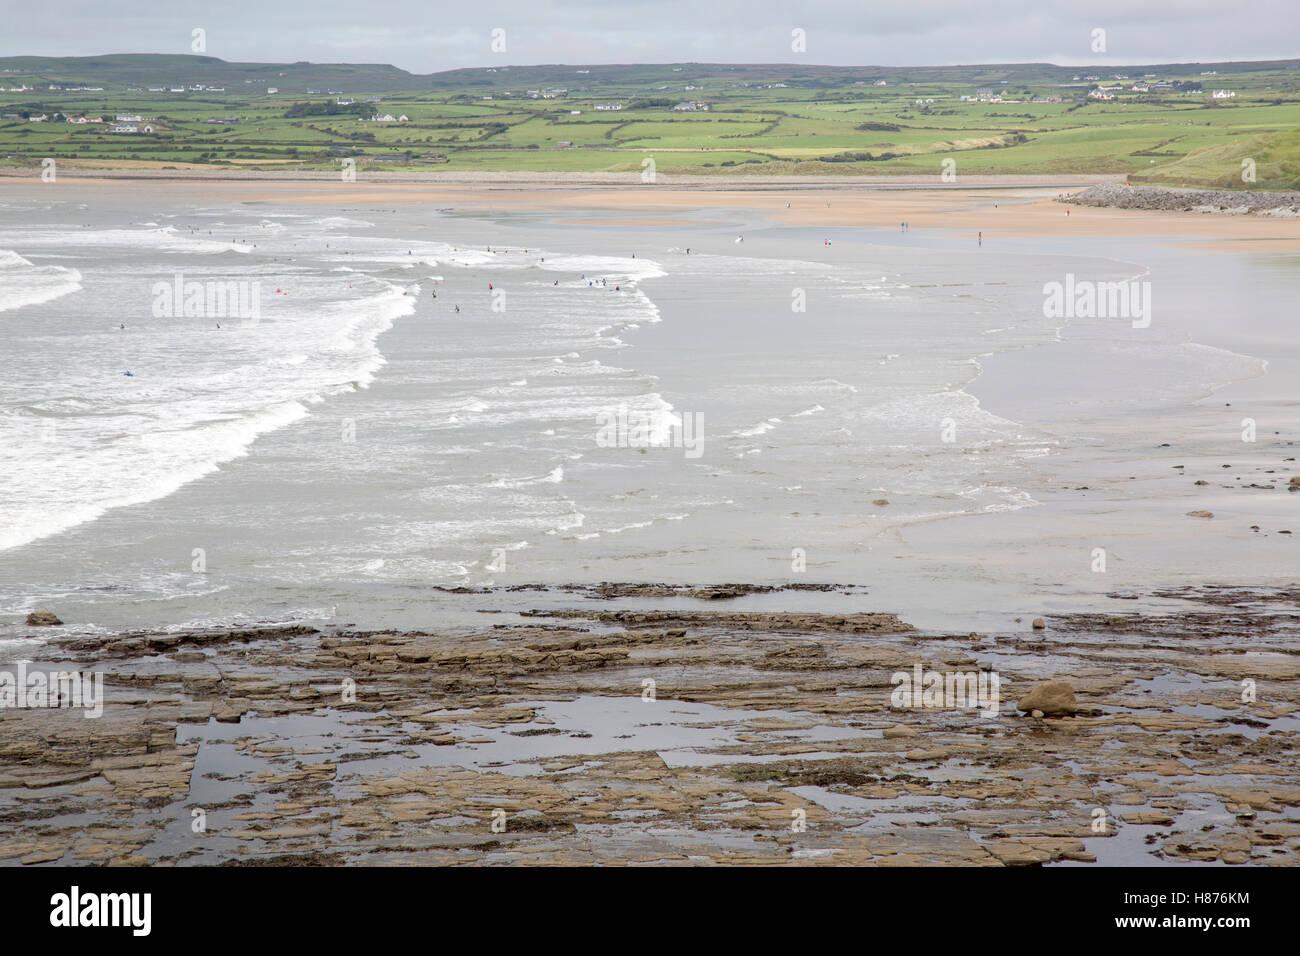 Lahinch Beach, Clare, Ireland, Europe - Stock Image